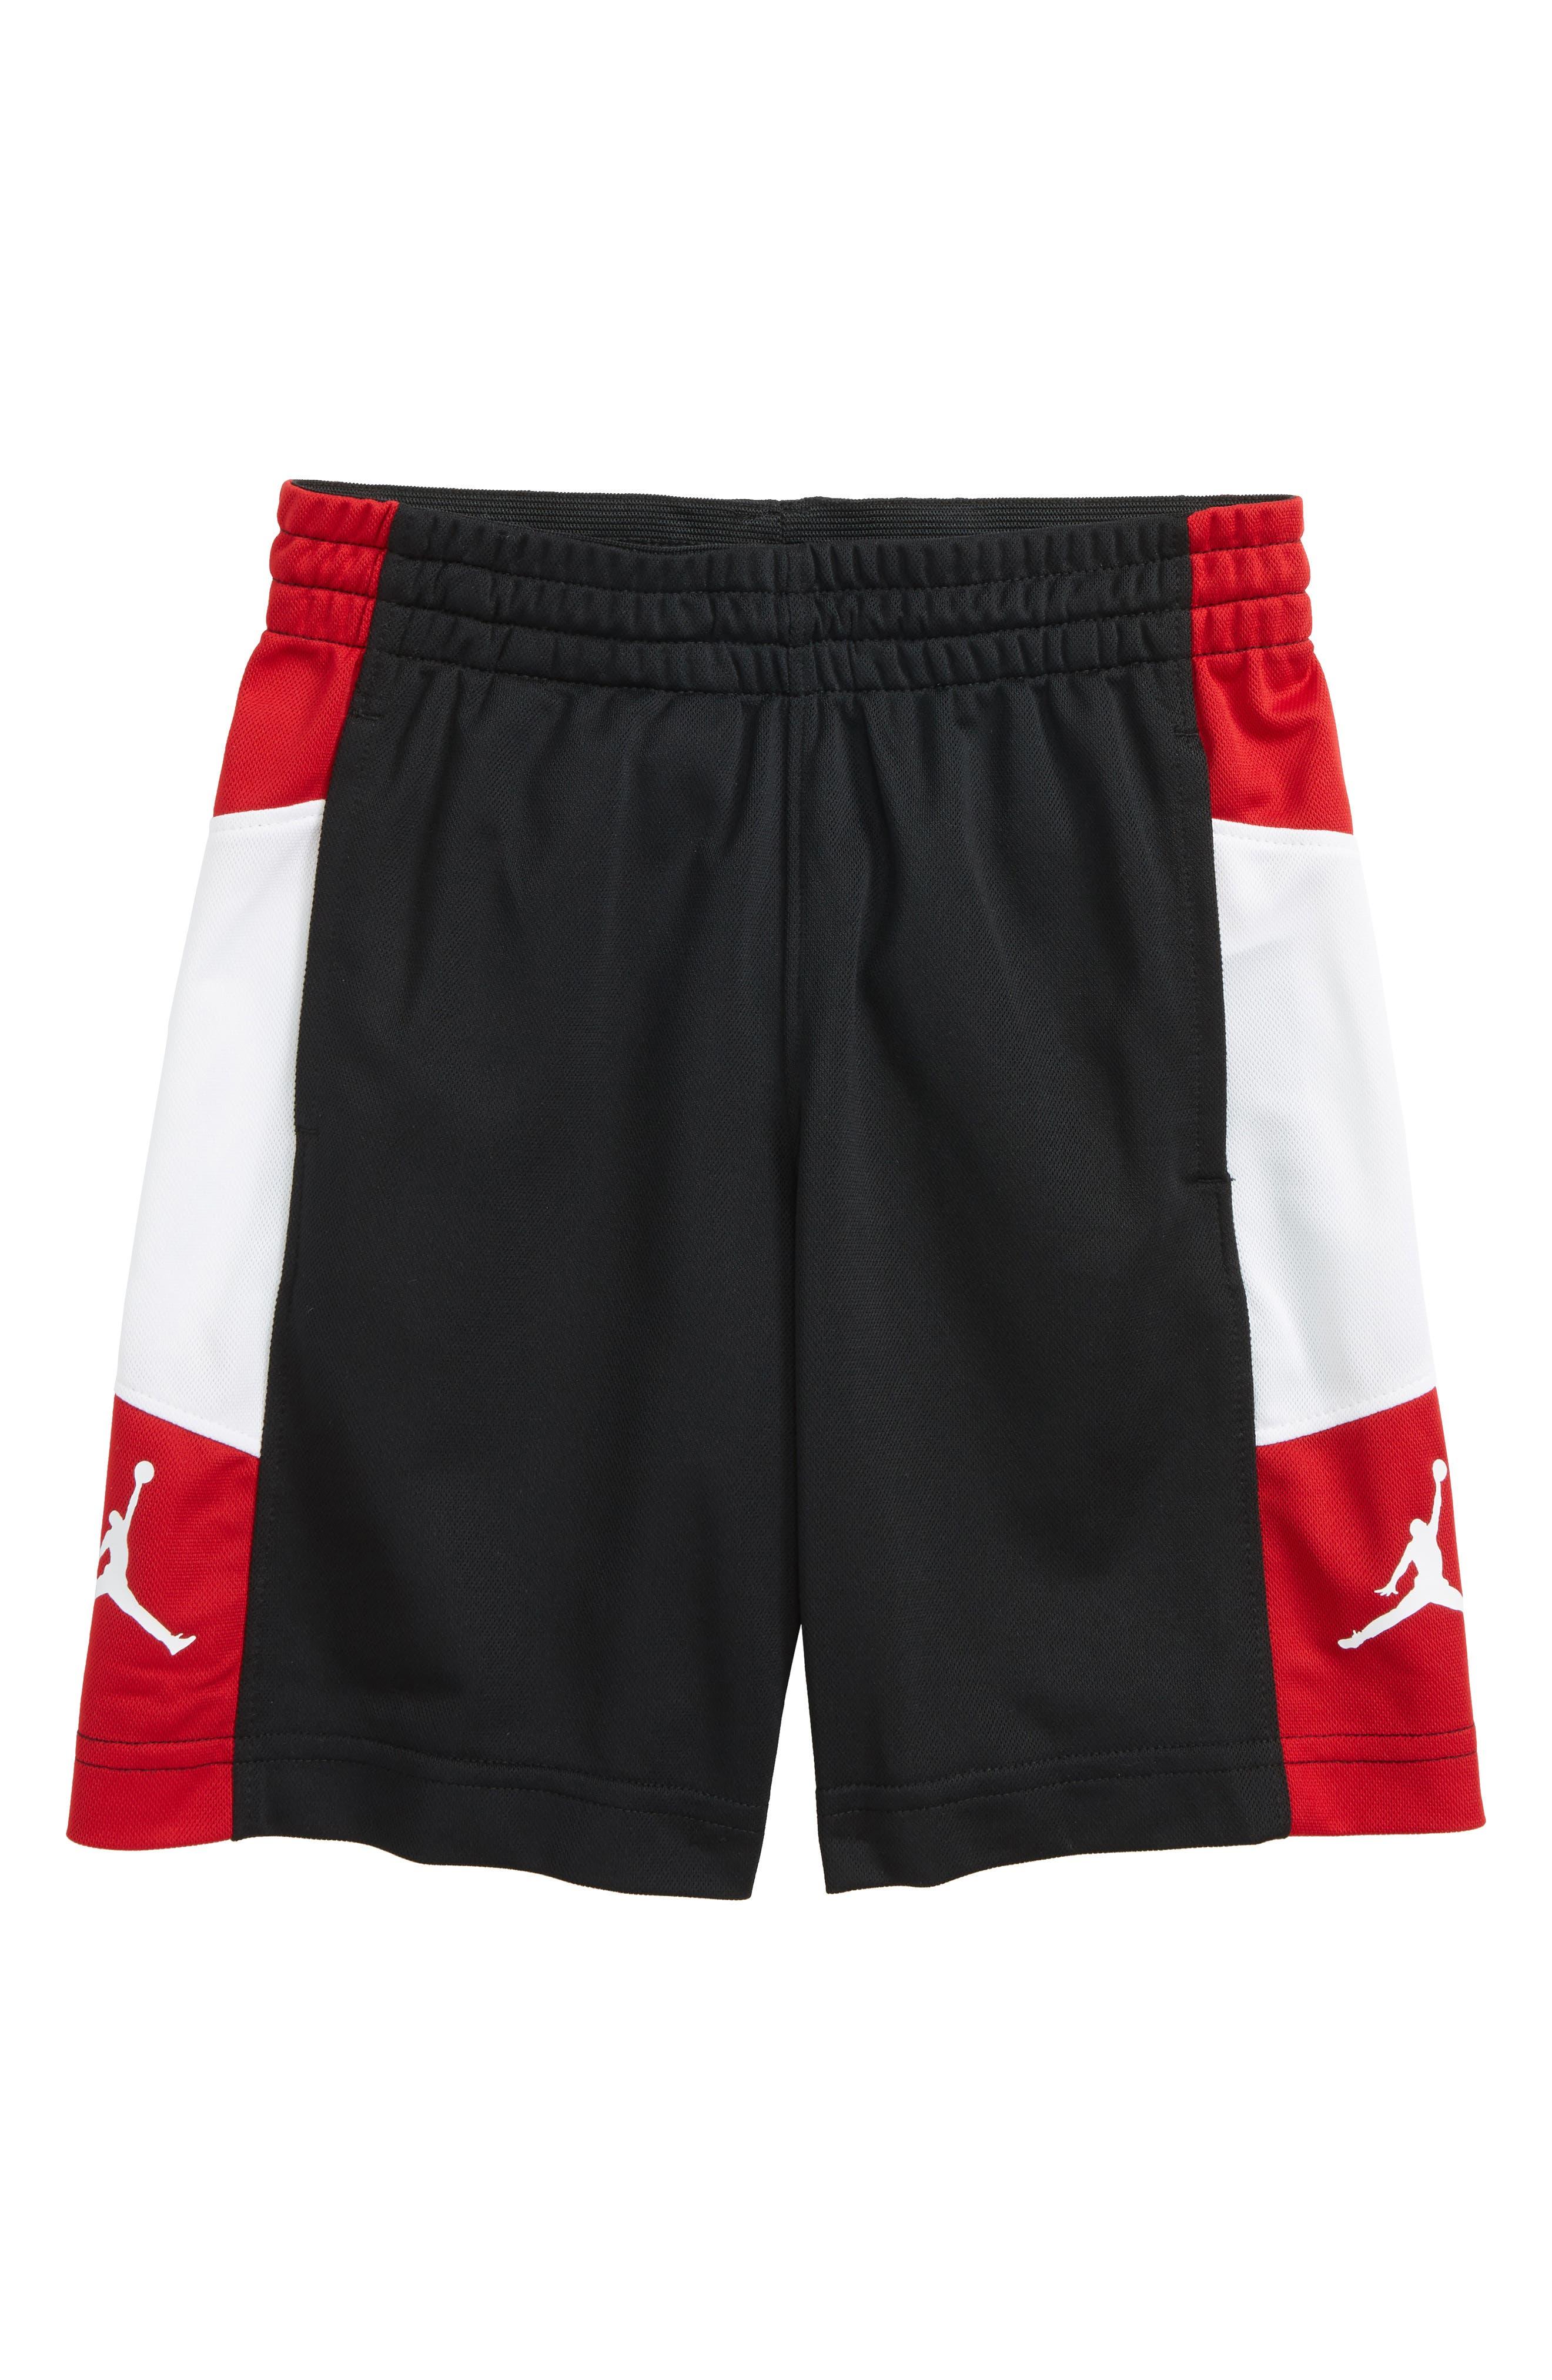 Jordan Rise Elevate Shorts,                         Main,                         color, 004